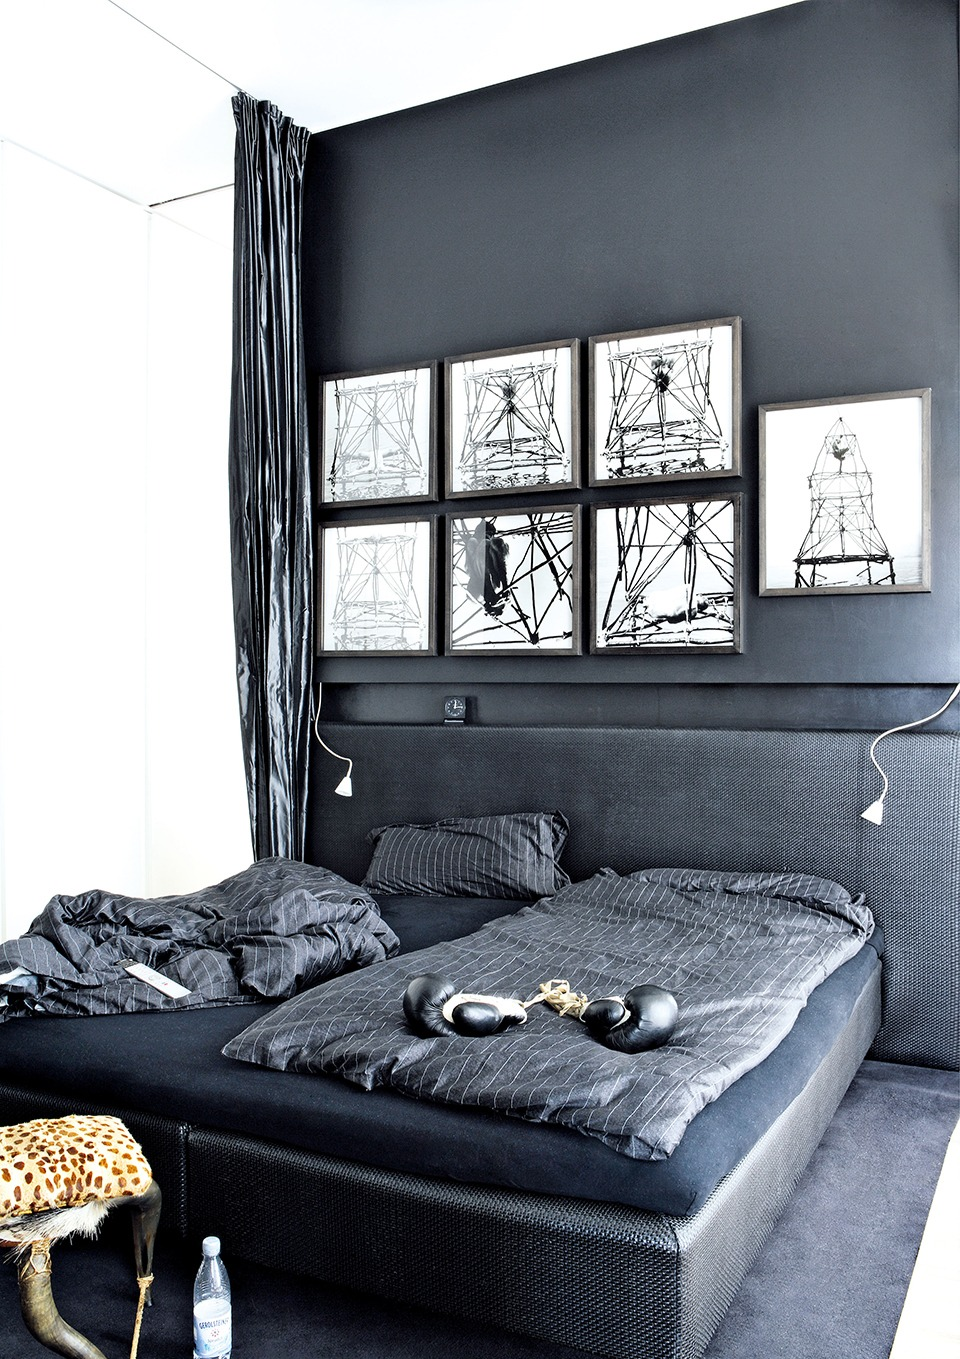 Bedroom decoration-white wall art on grey tones